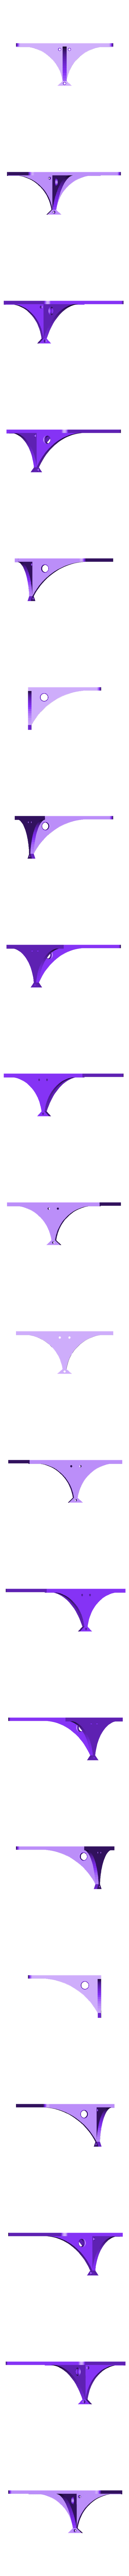 meShelveL.stl Descargar archivo STL Single shelve • Plan de la impresora 3D, miguelonmex